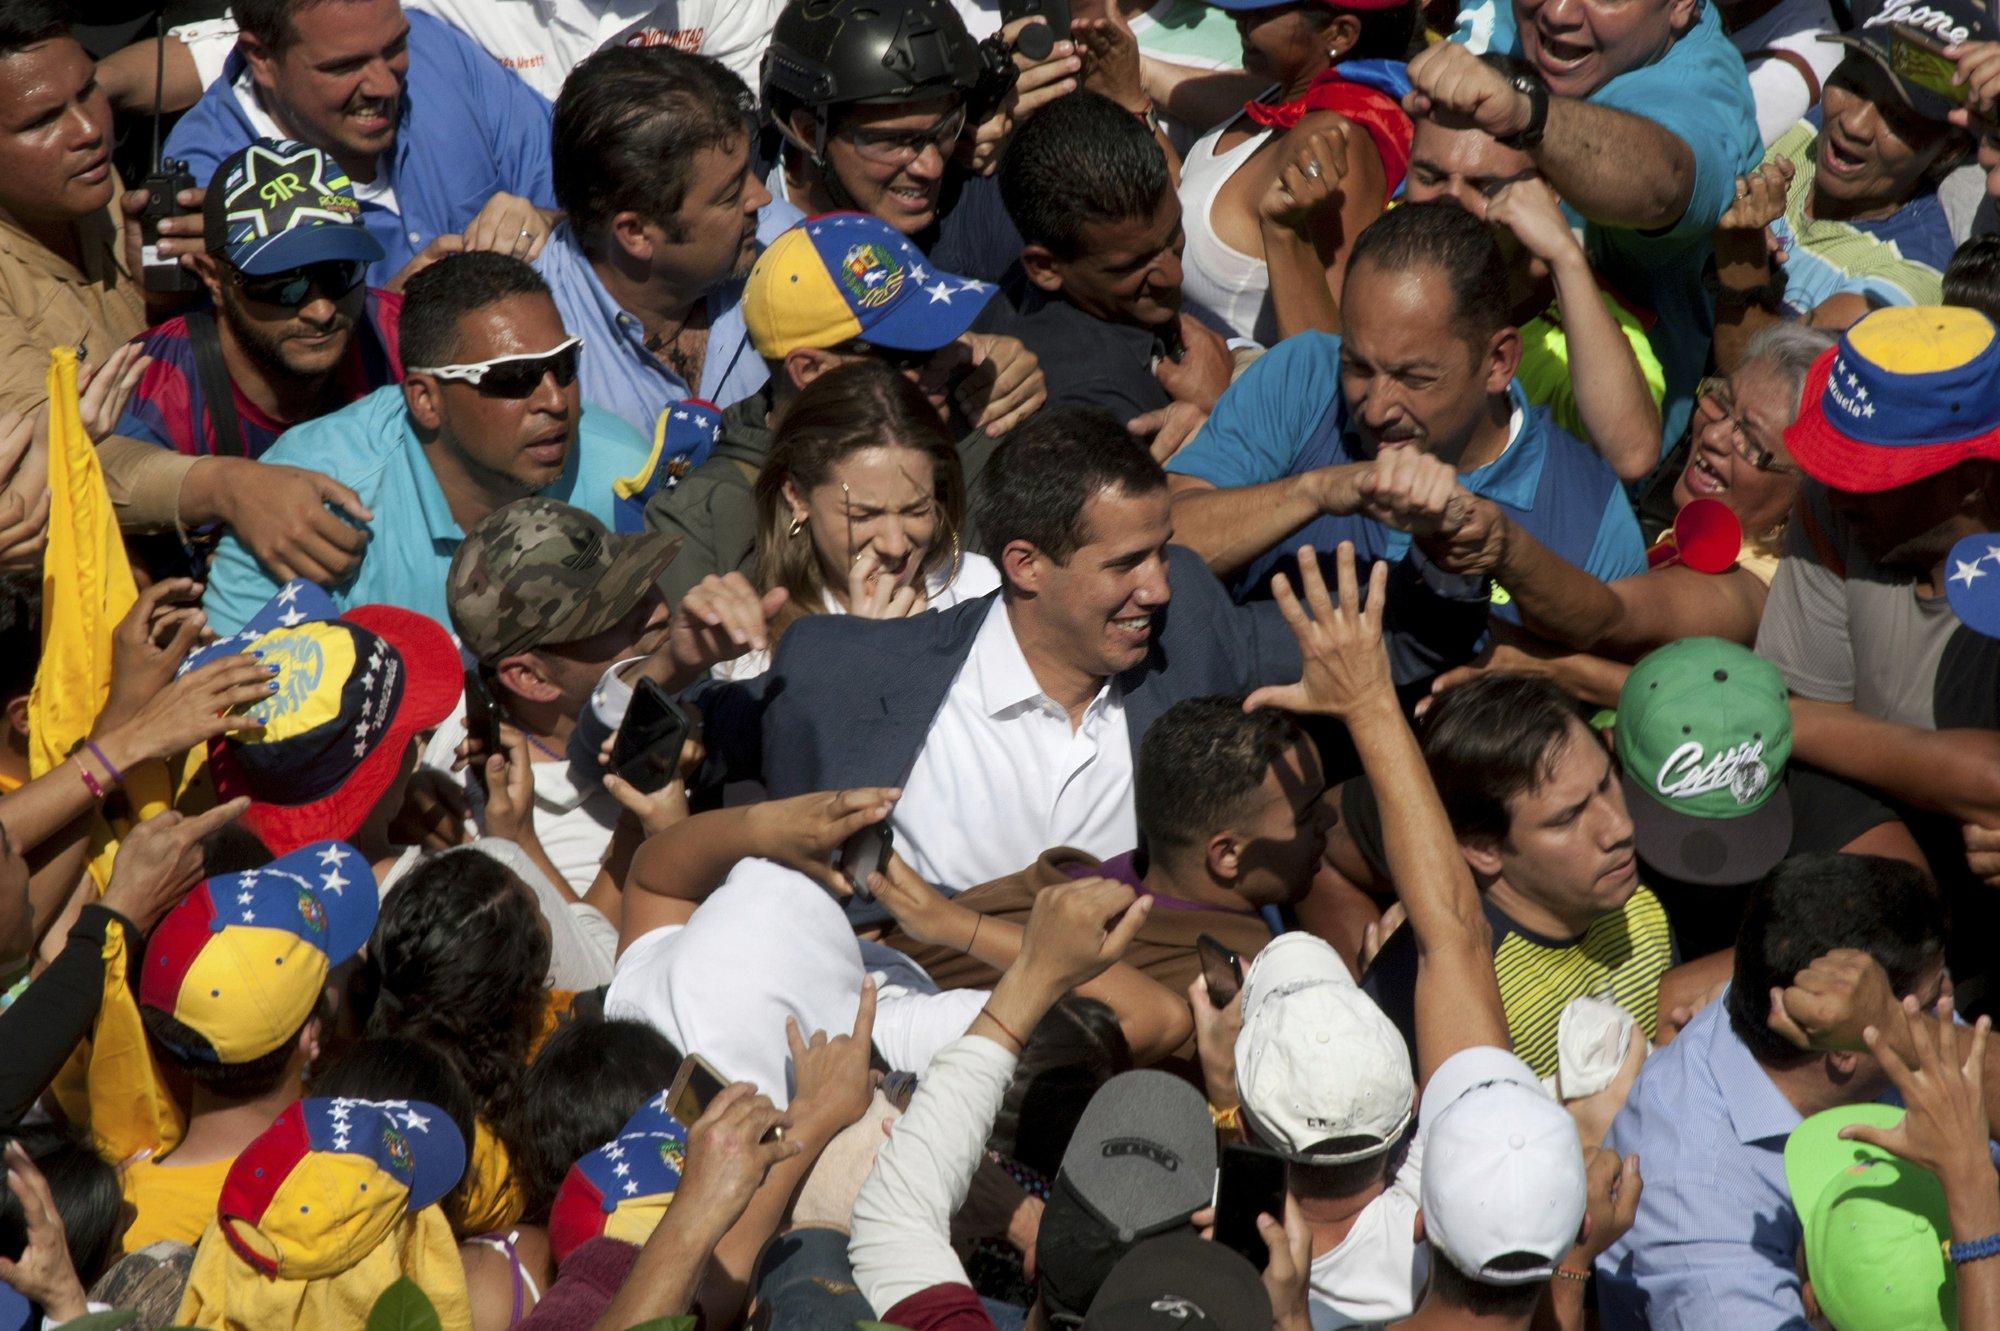 EU countries step up pressure on Venezuela's defiant Maduro